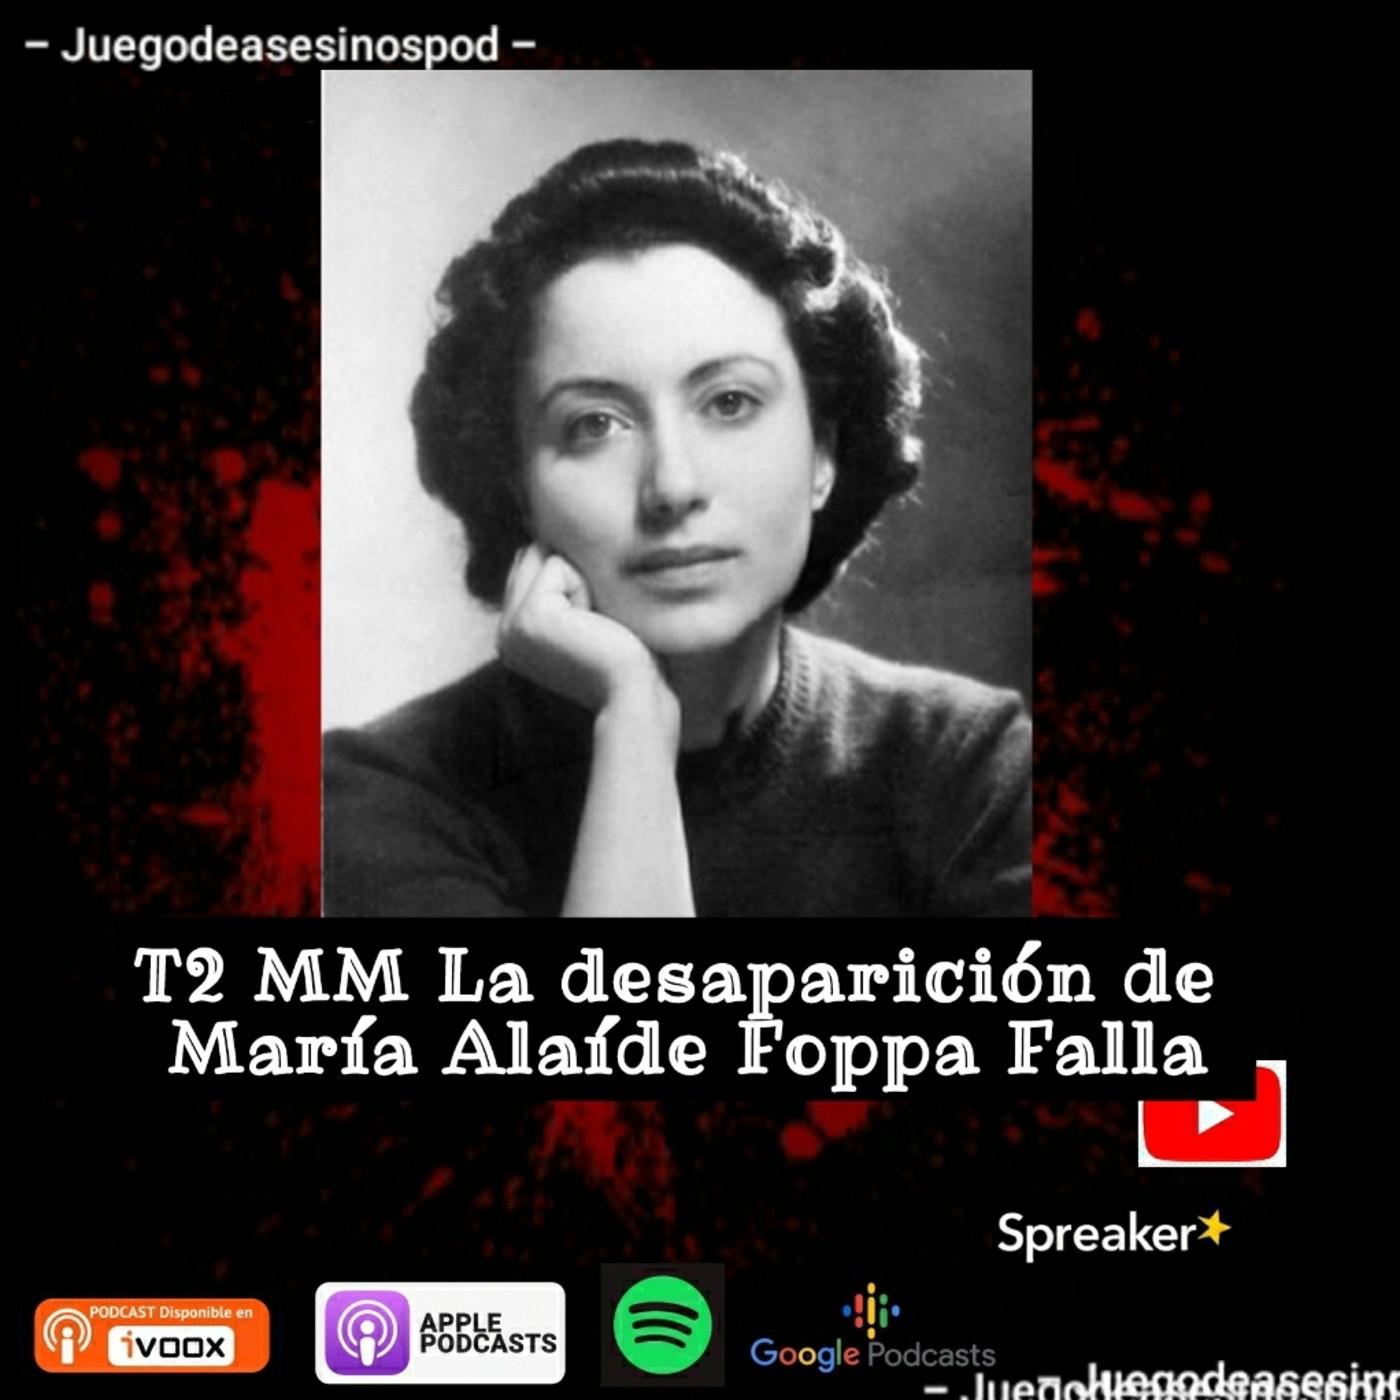 T2 MM La desaparicion de Maria Alaide Foppa